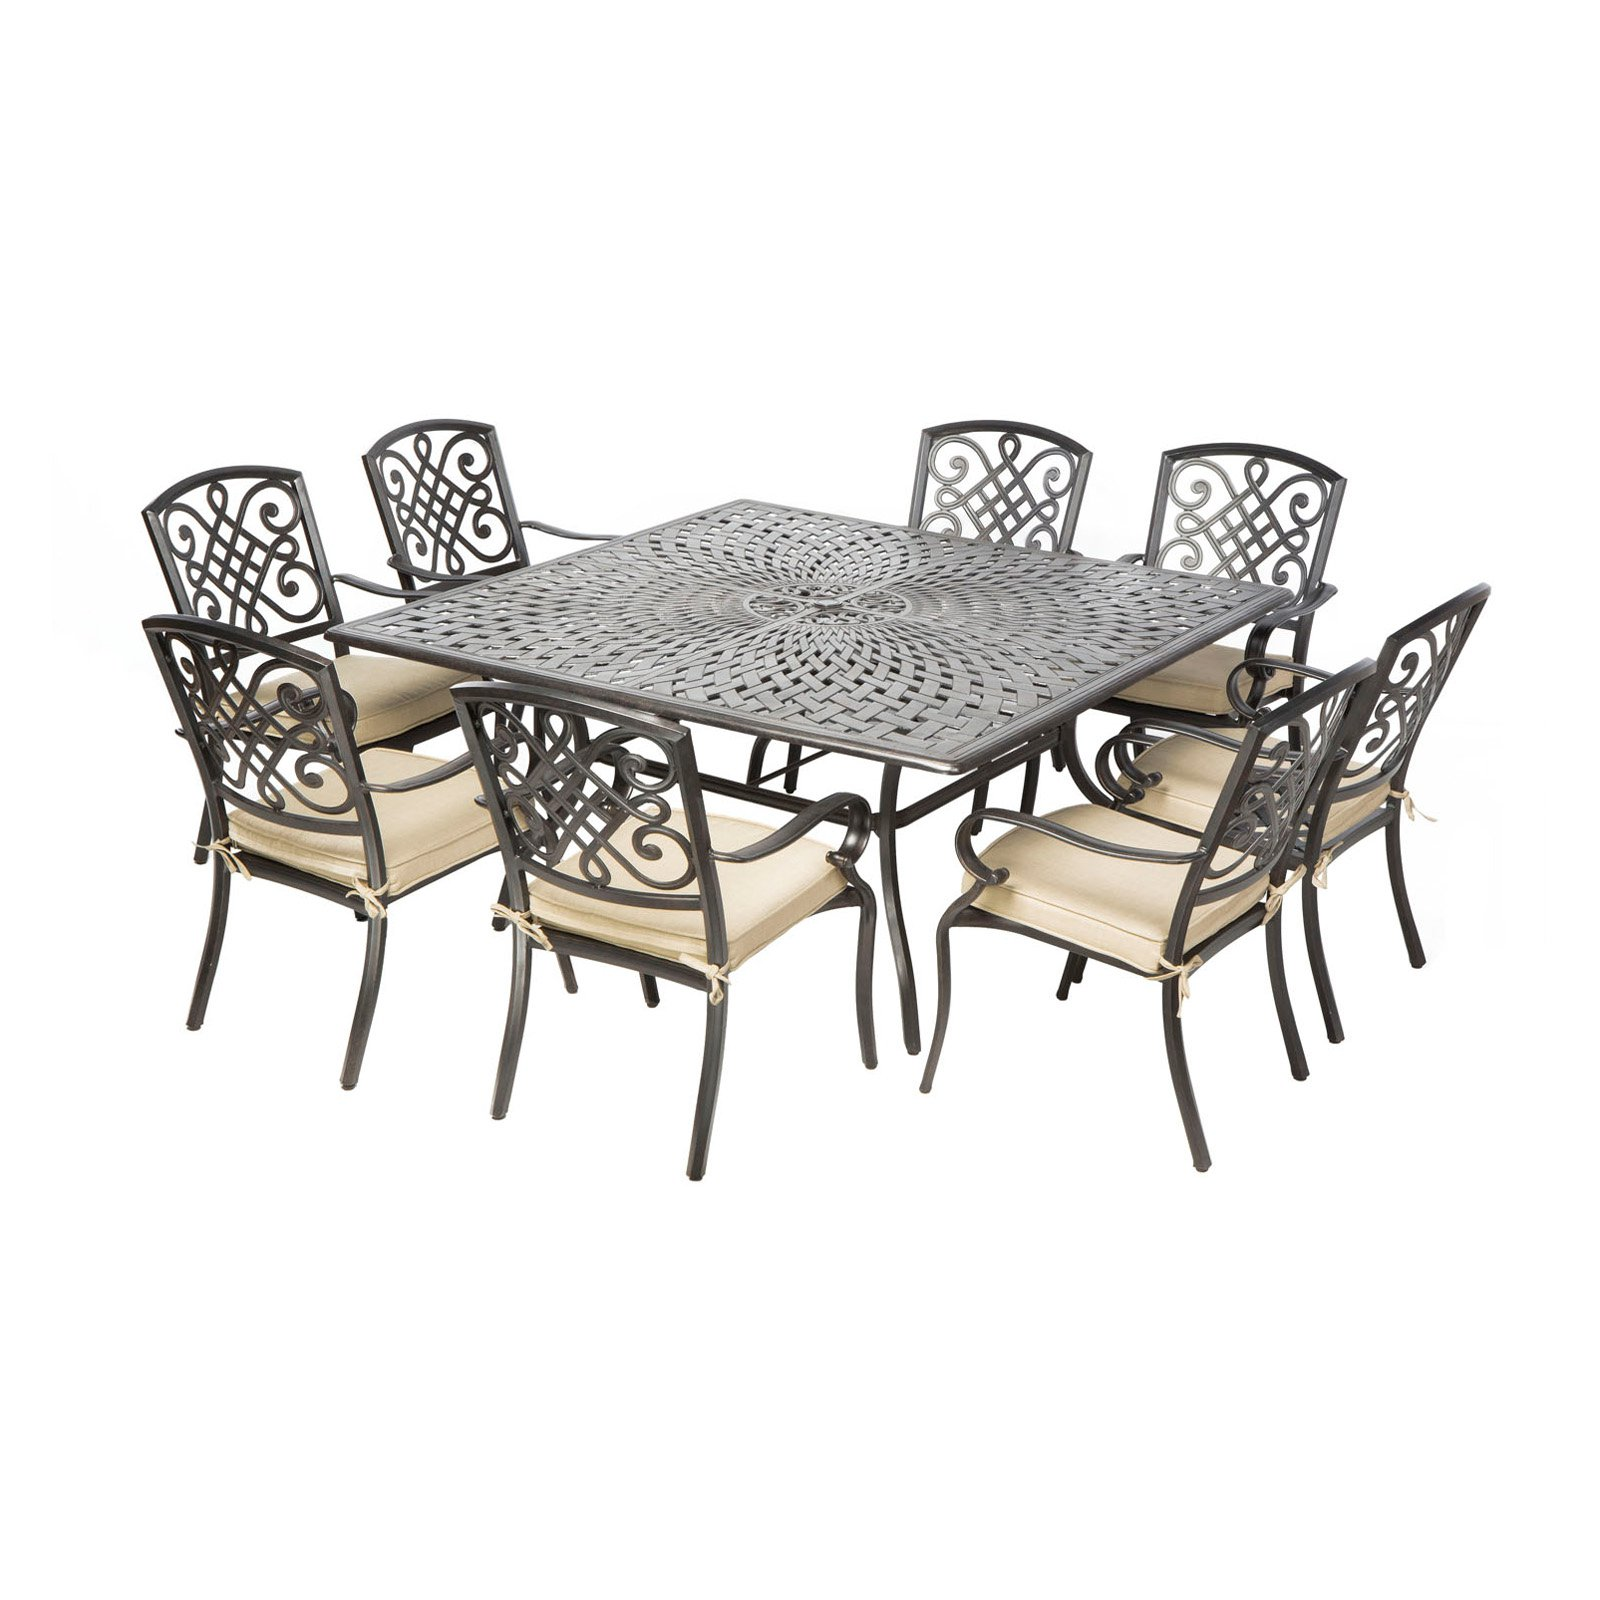 alfresco home barcelona square cast aluminum patio dining set seats 8